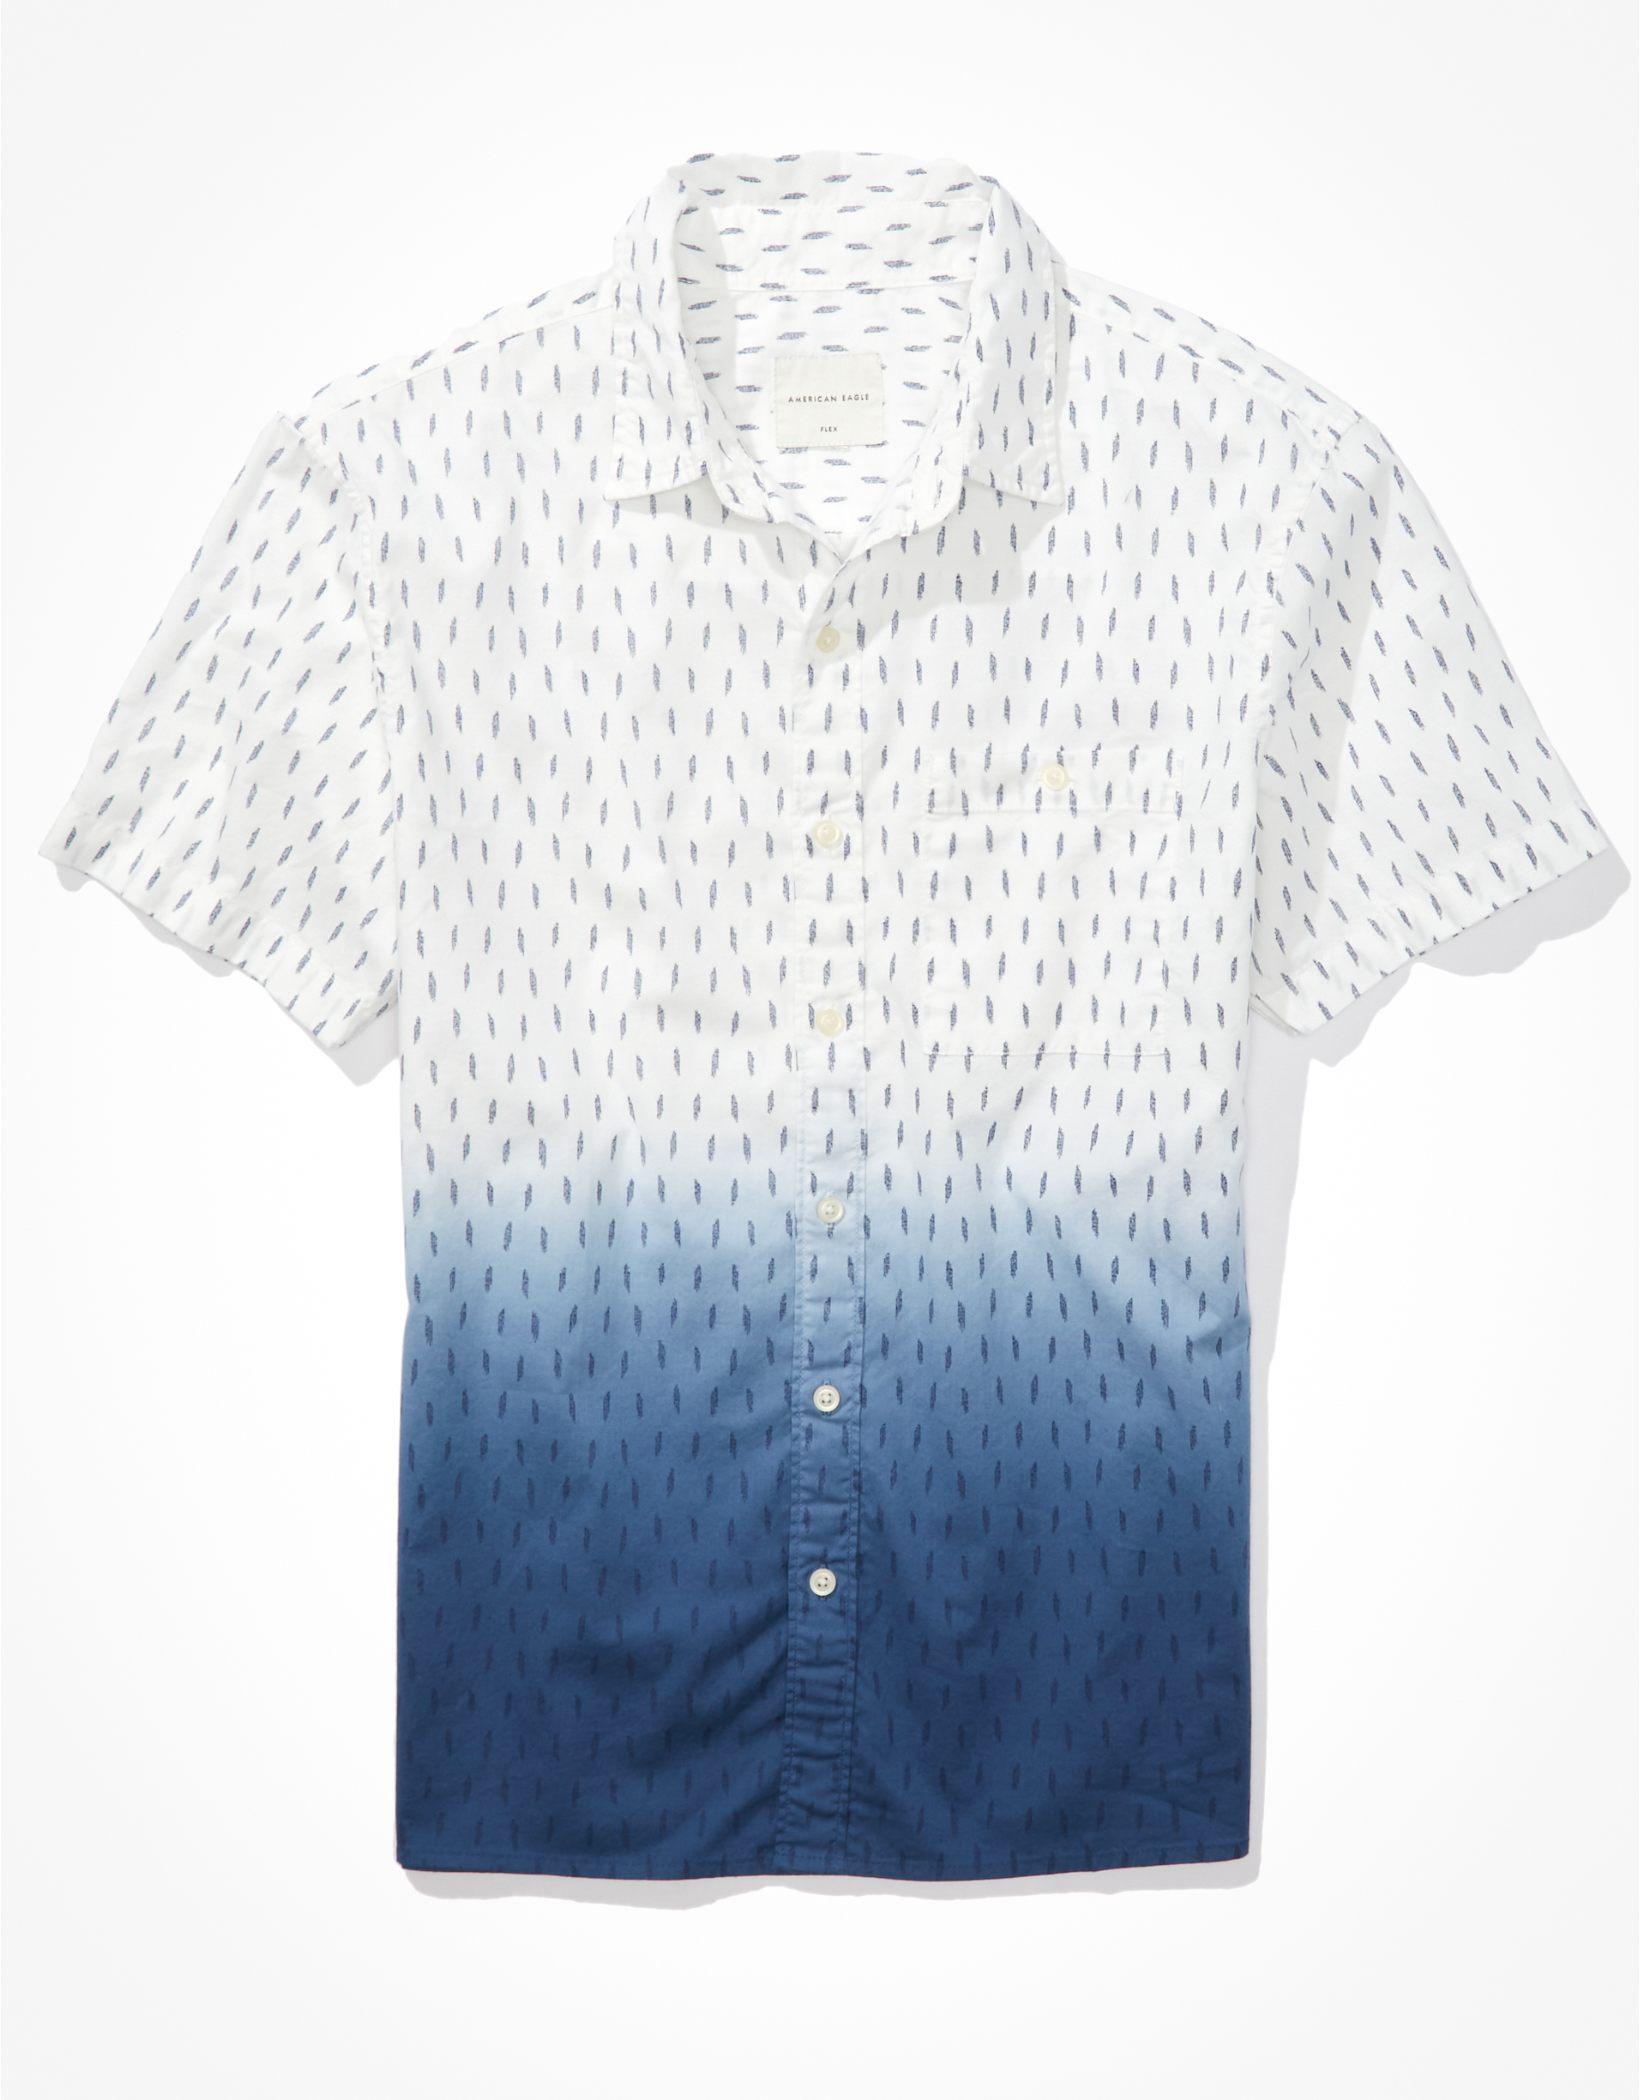 AE Dip-Dye Short-Sleeve Button-Up Shirt